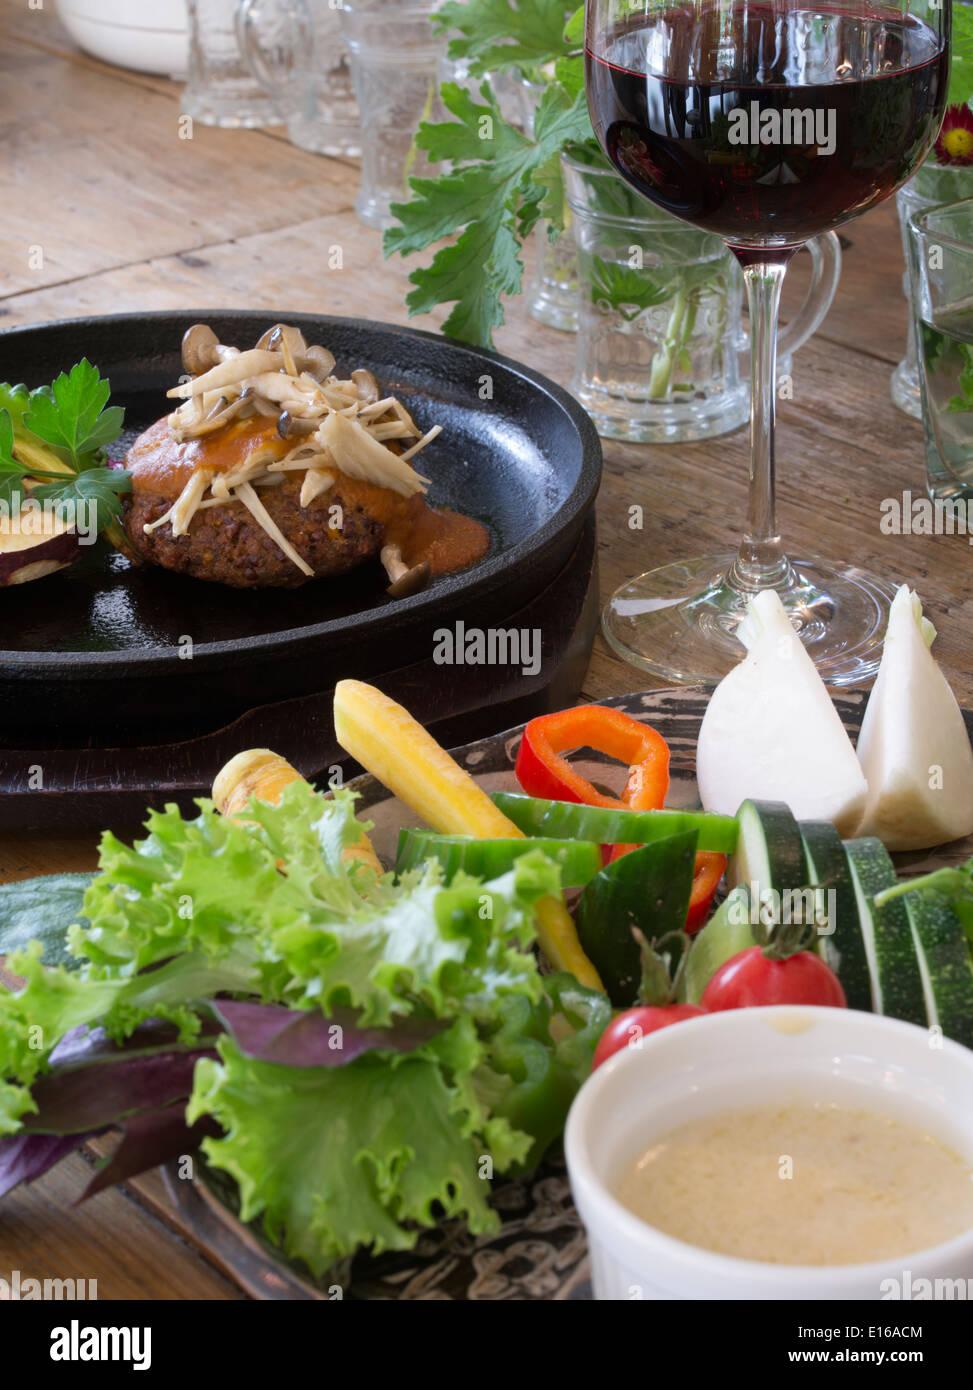 Organic locally grown vegetables at Ukishima Garden vegan restaurant, Naha, Okinawa - Stock Image